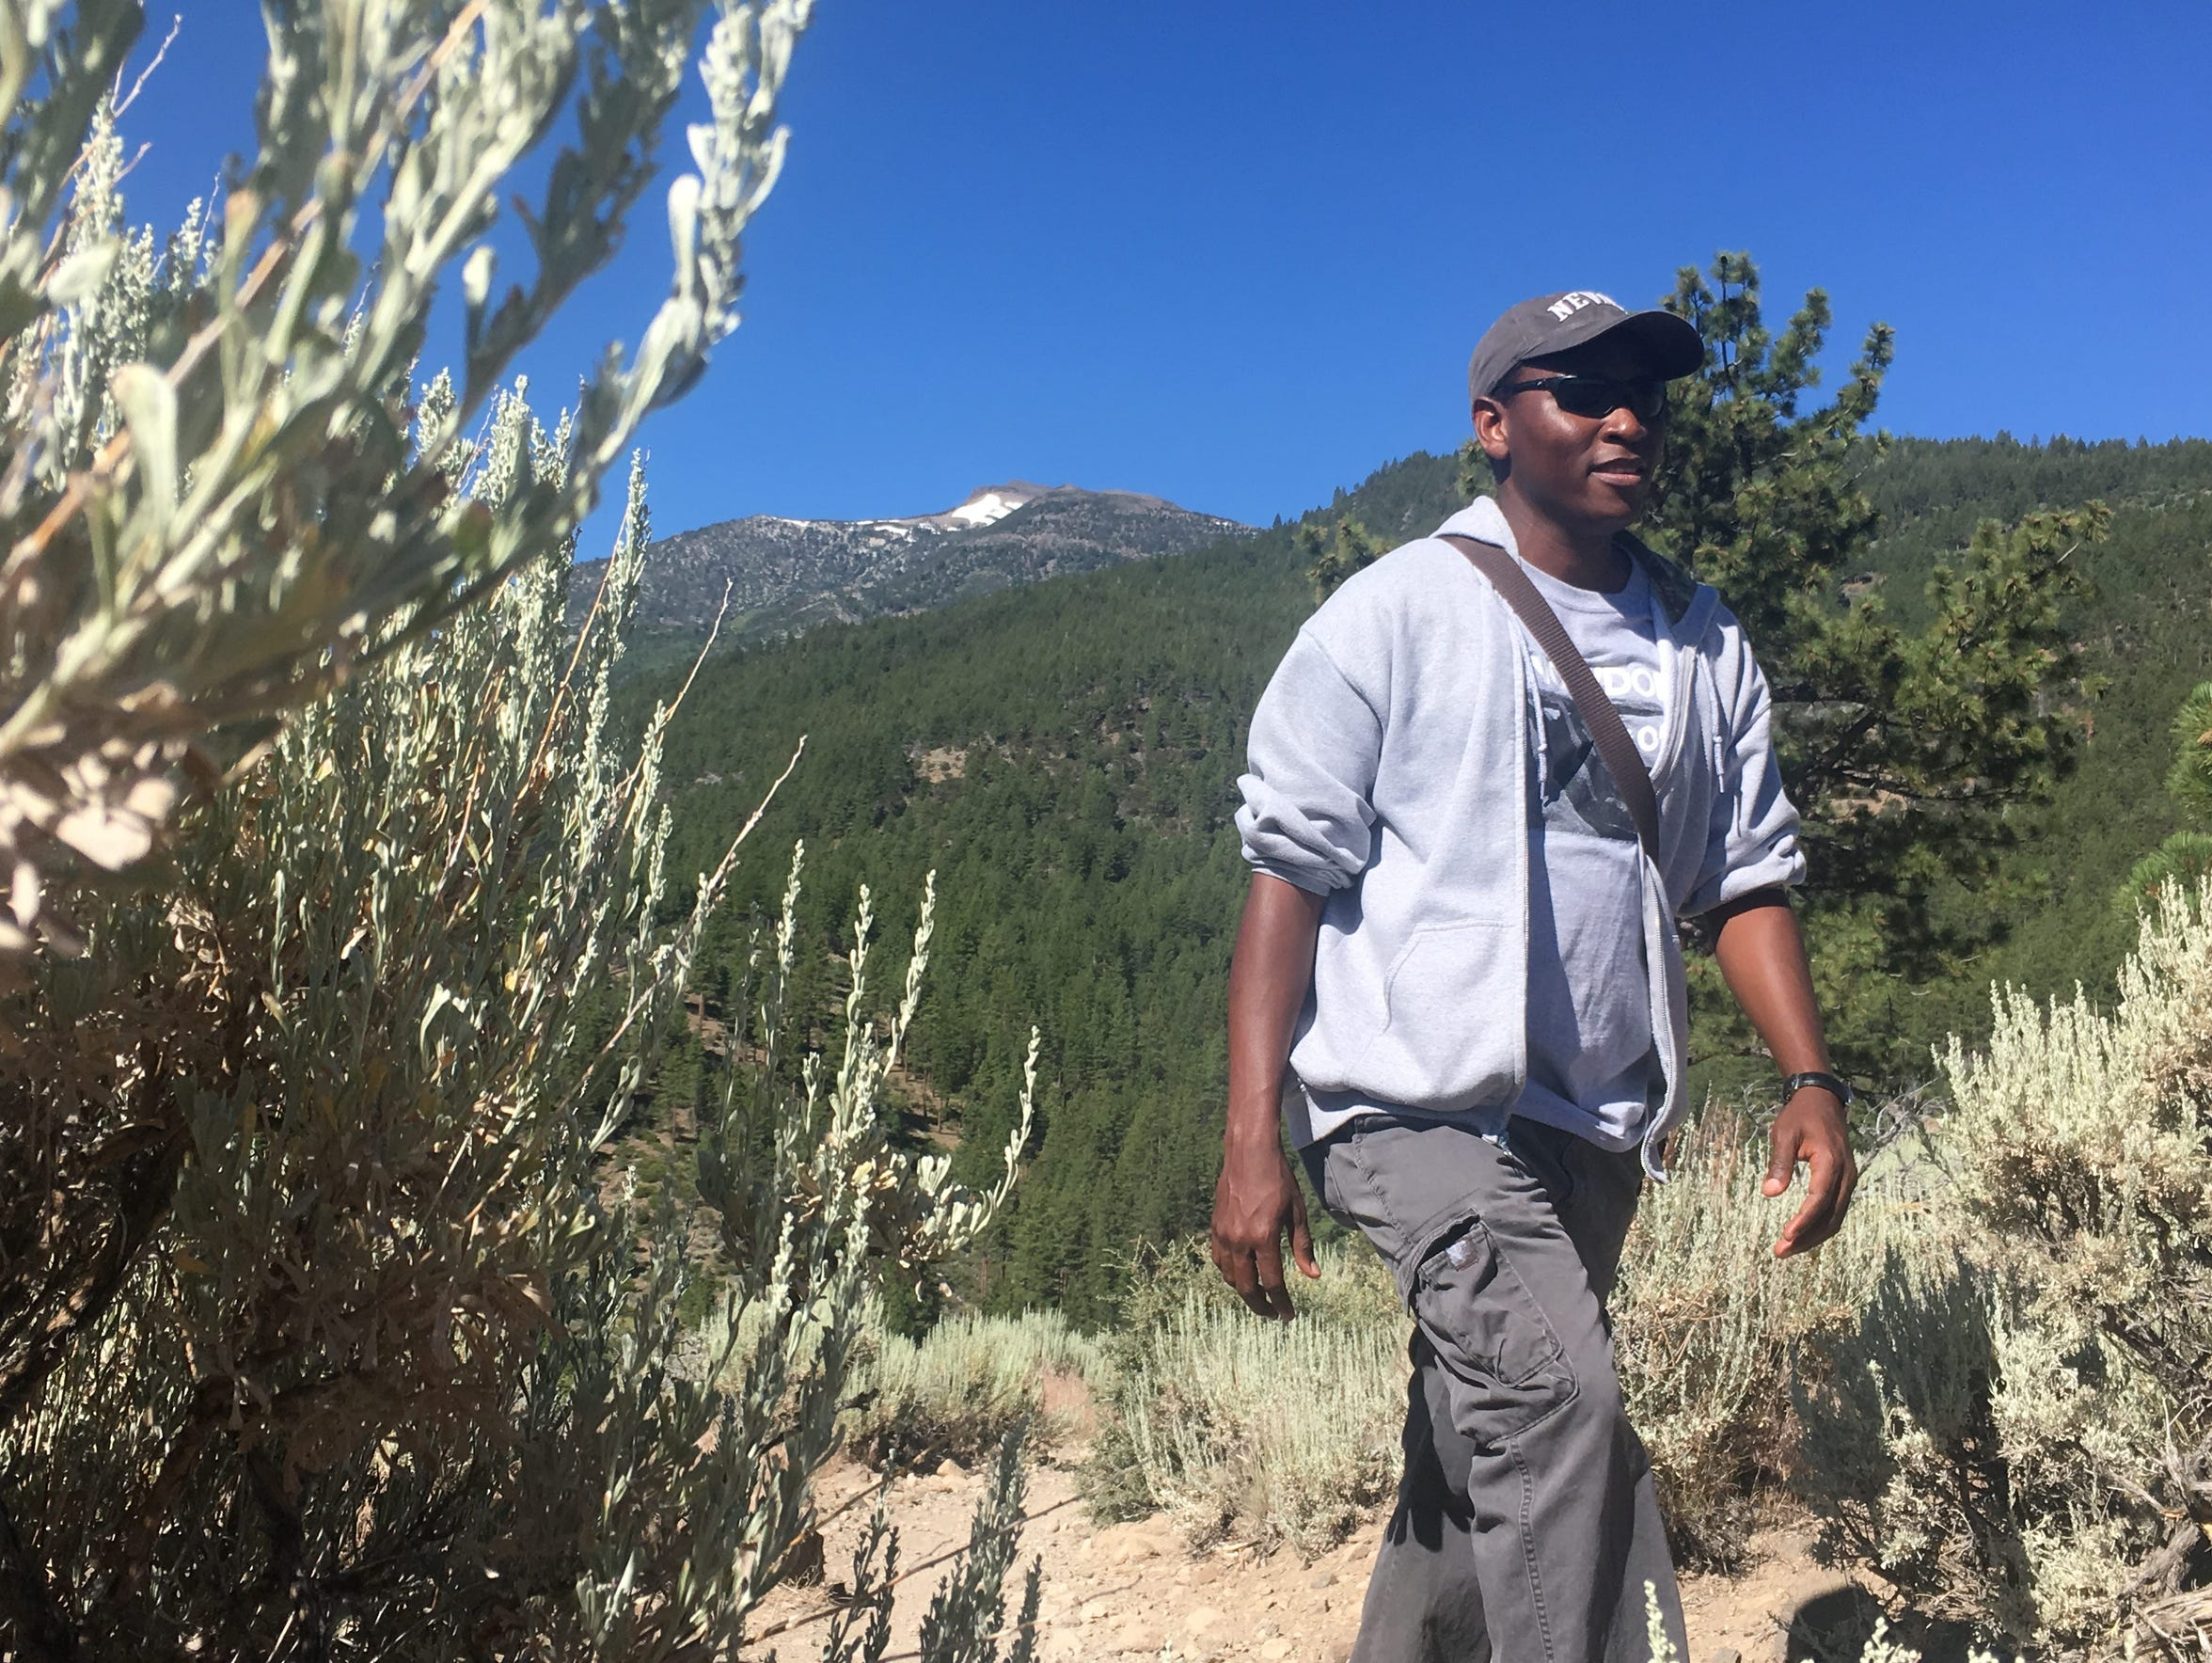 Hiker Israel Borokini of Reno says people are often